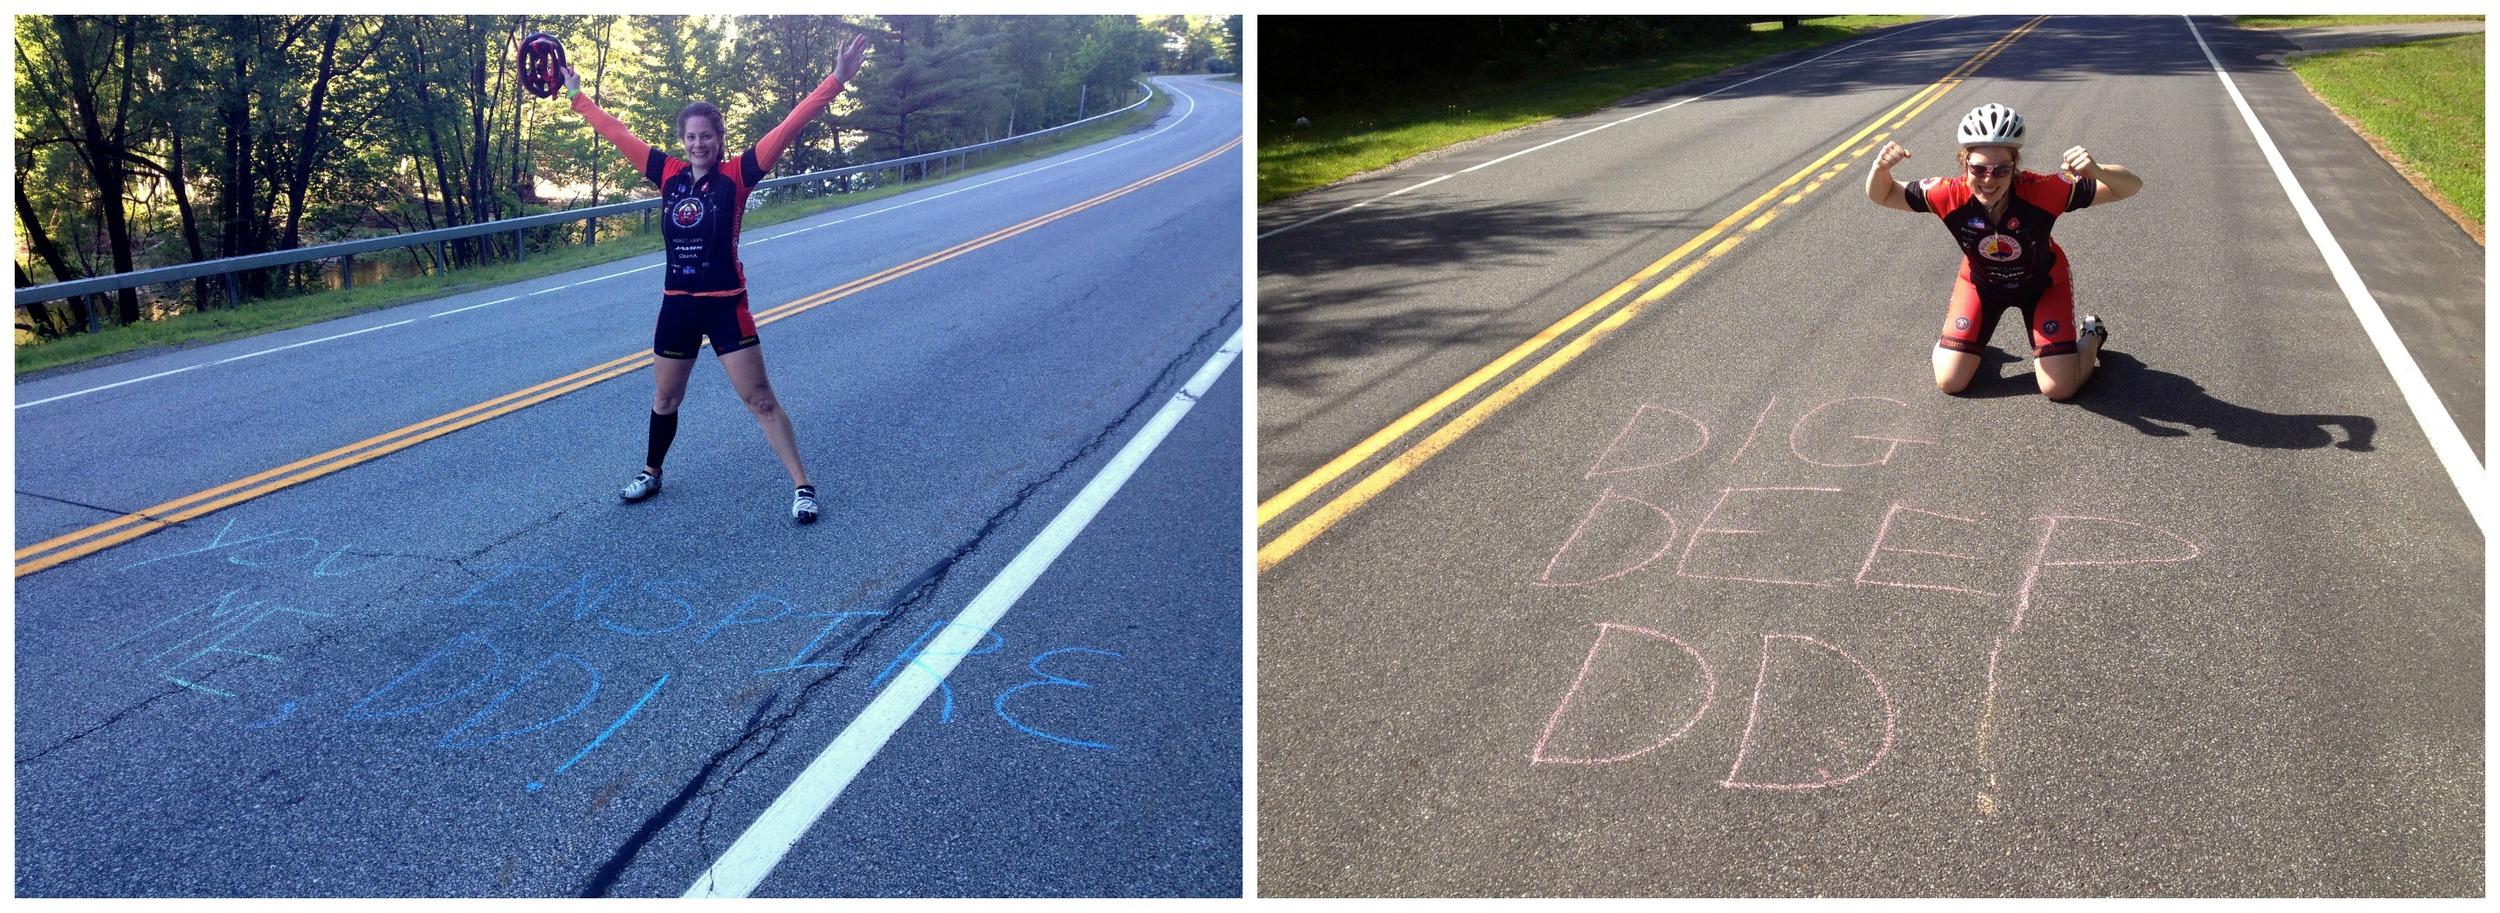 fte-blog-ironman-lake-placid-chalk-bike-course.jpg